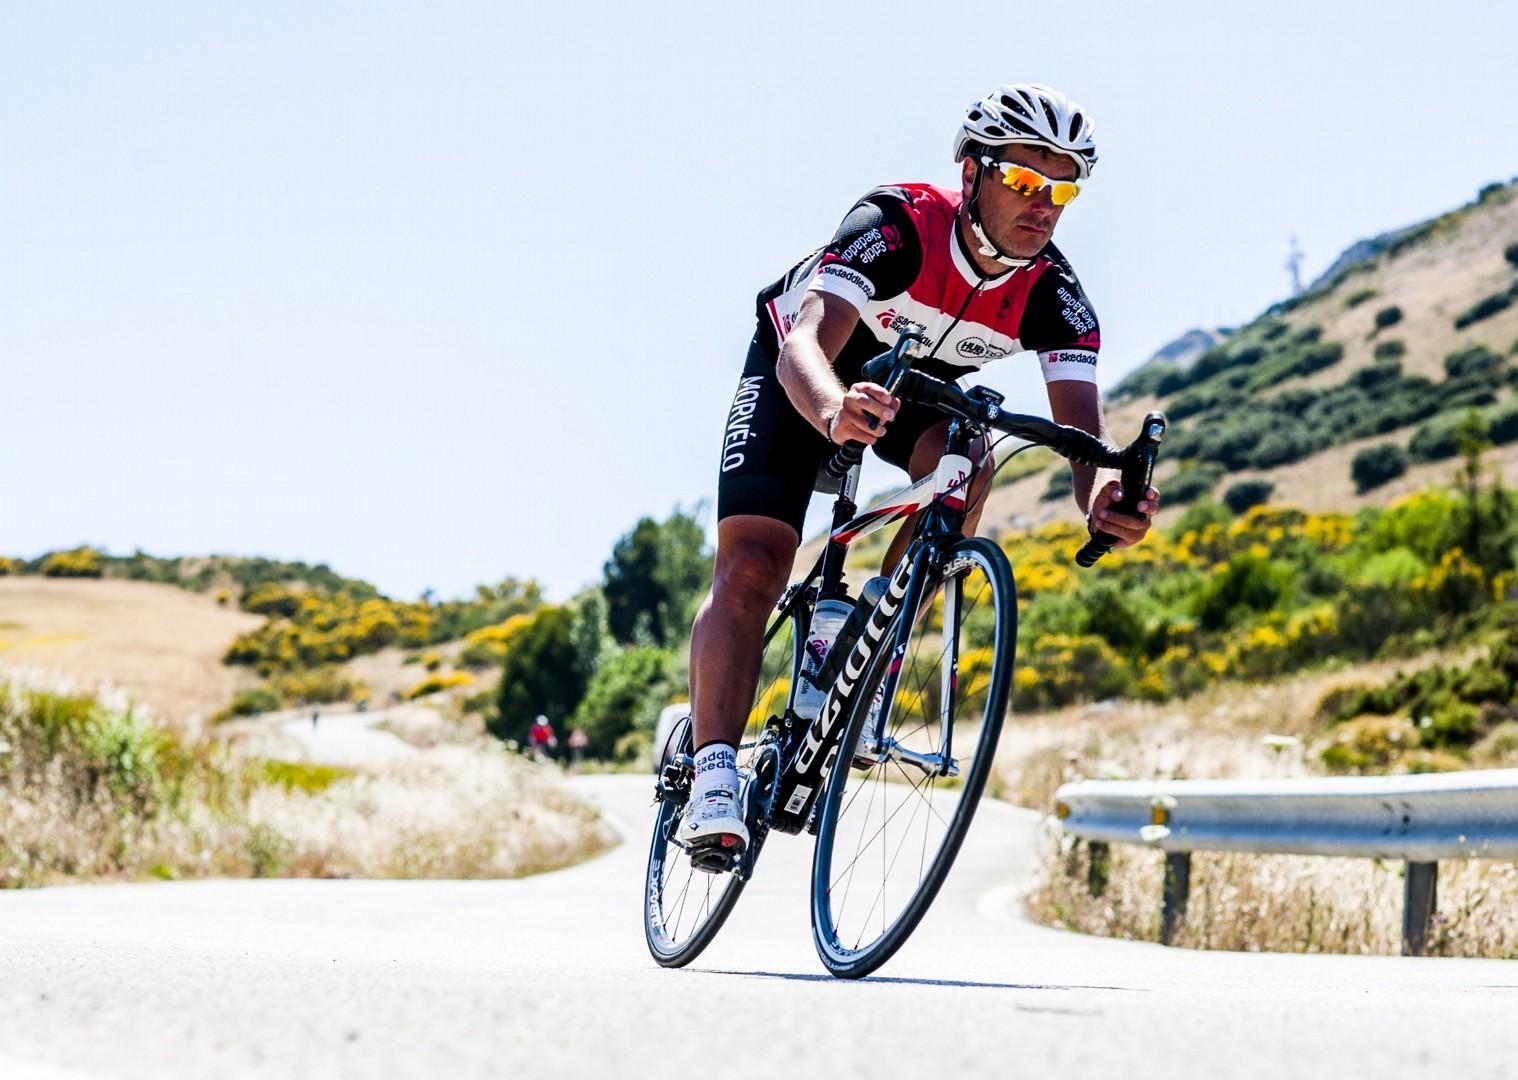 ronda.jpg - Southern Spain - Roads of Ronda - Road Cycling